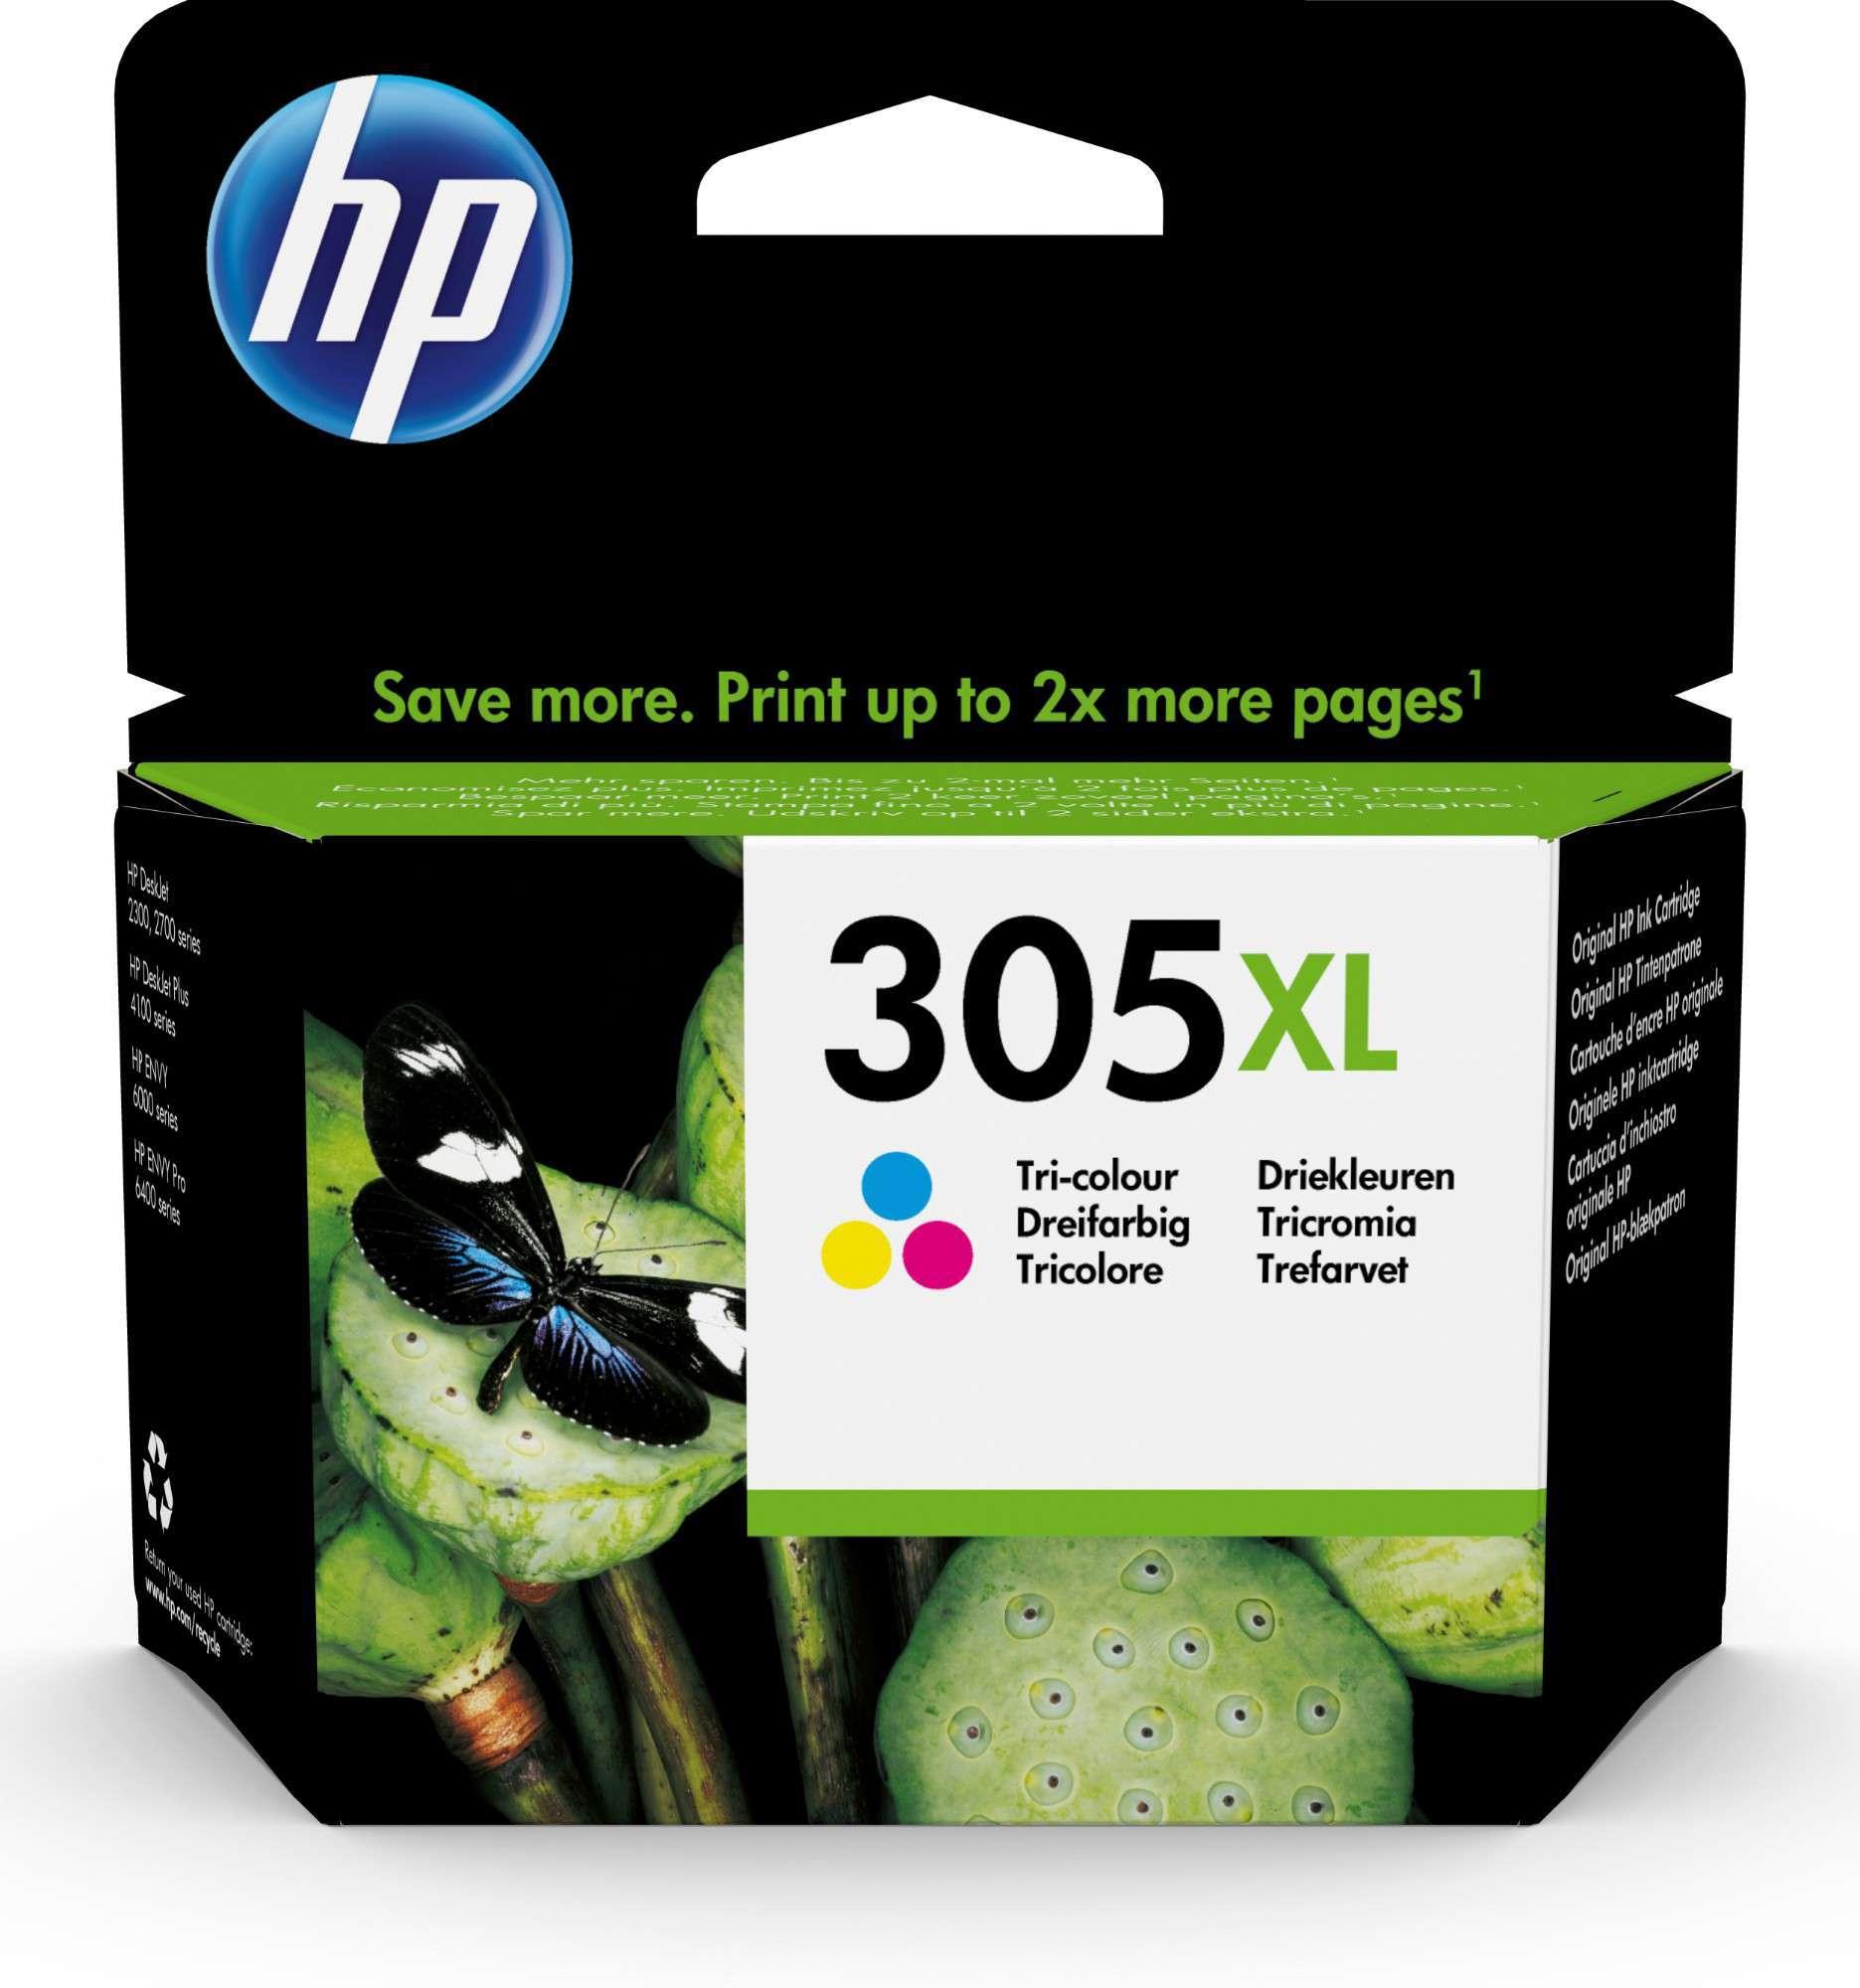 HP Original 305XL Tri-Colour High Capacity Inkjet Cartridge 3YM63AE